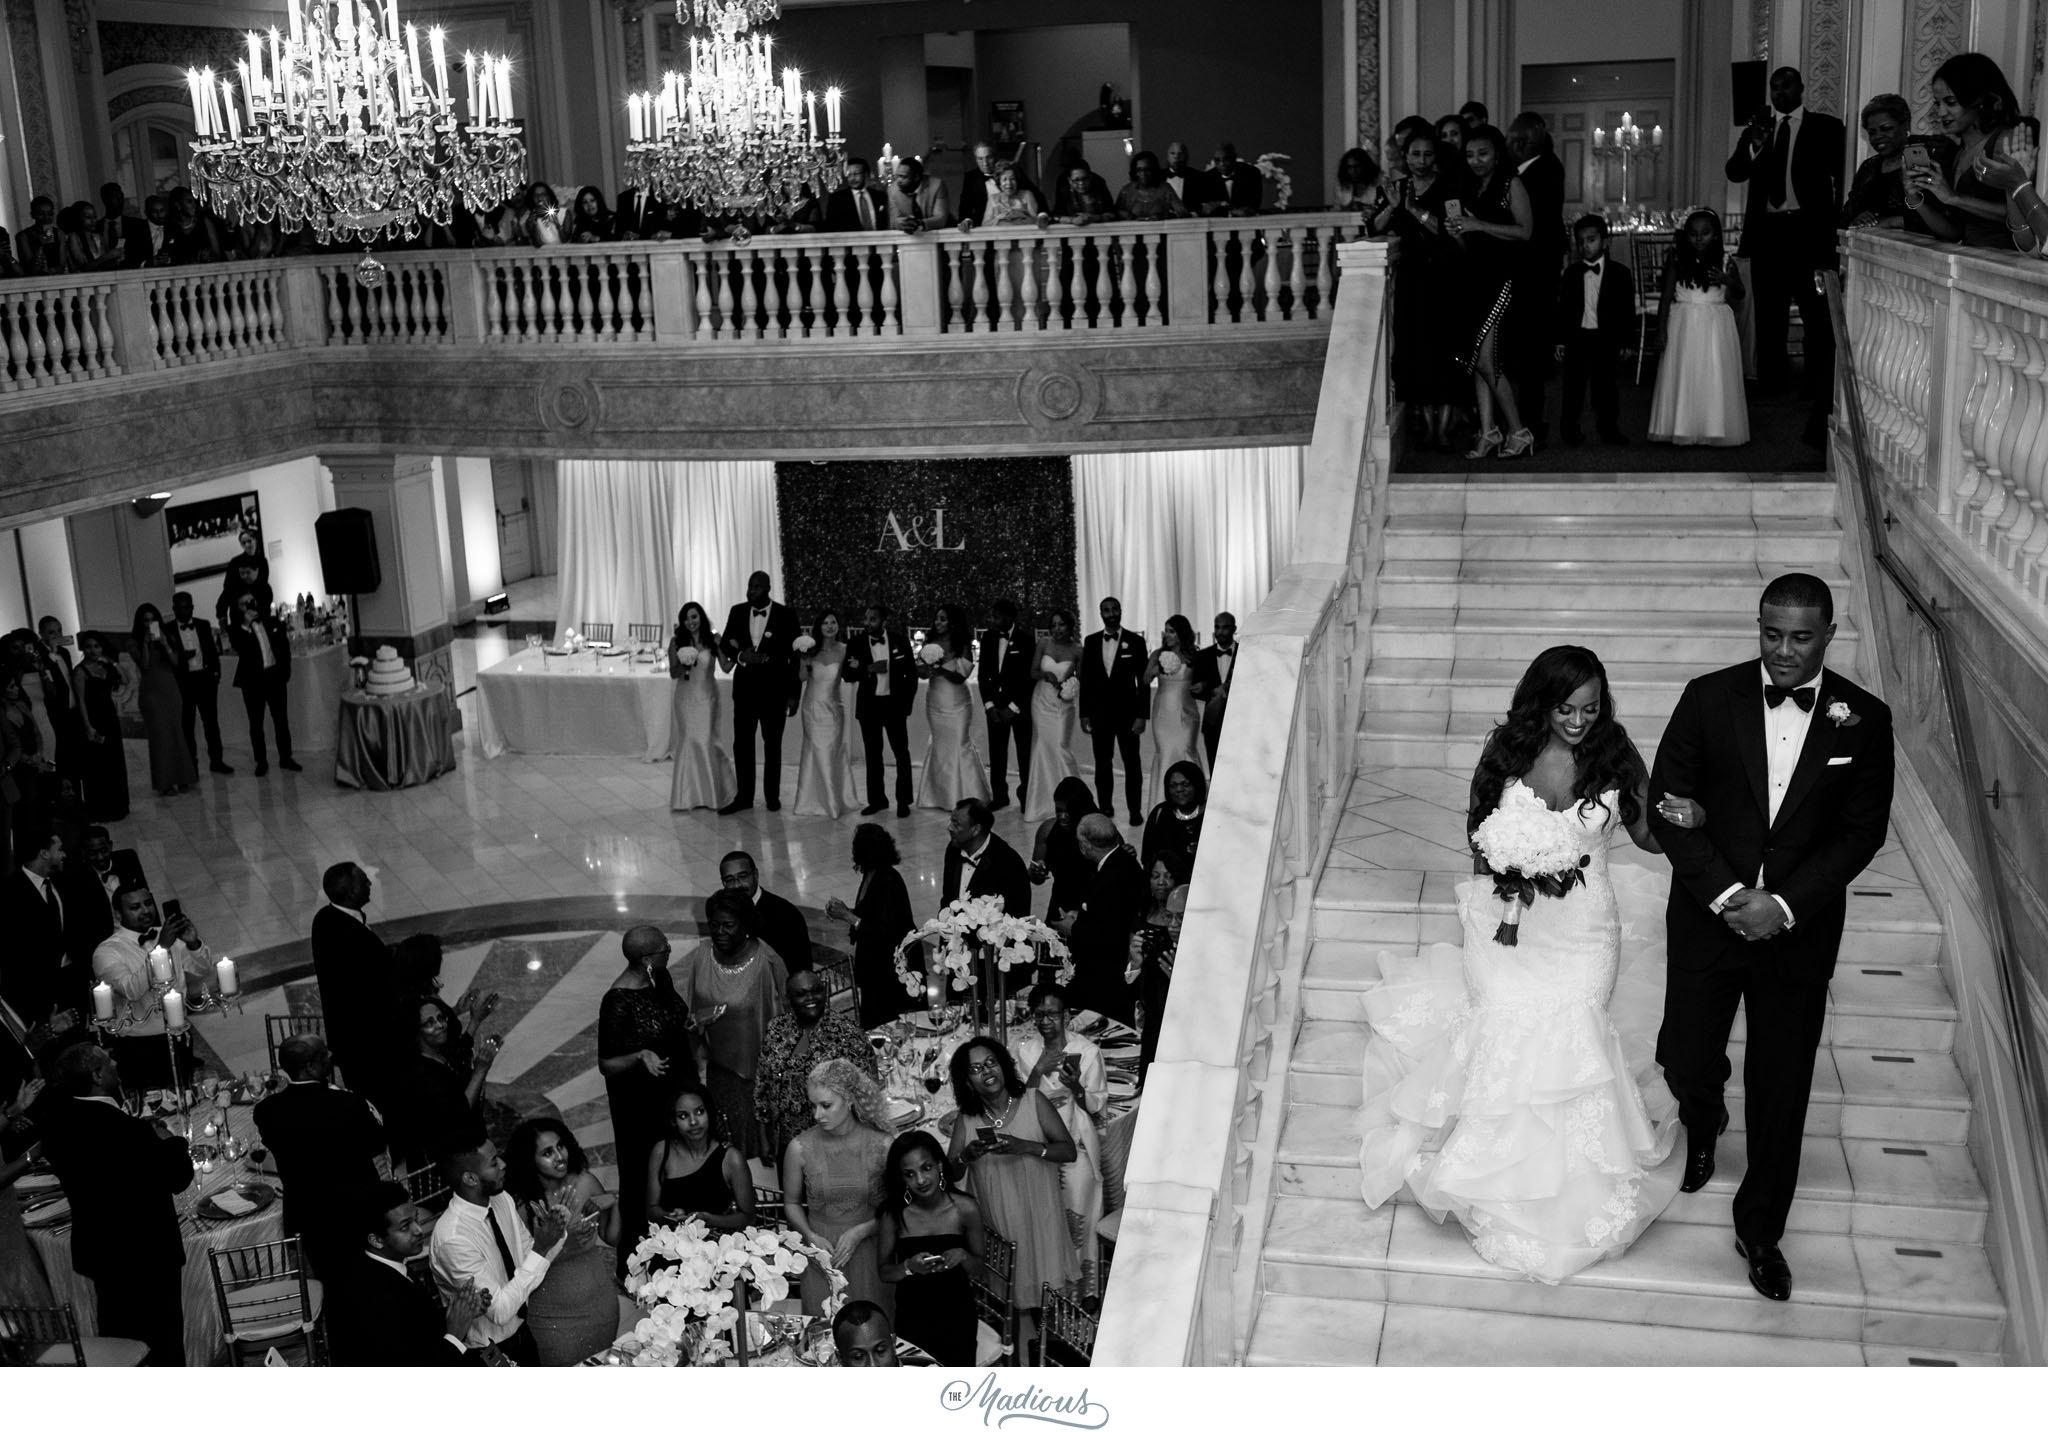 nmwa+wedding,+women+in+the+arts+wedding,+ethiopian+wedding,+dc+wedding+0174.jpg